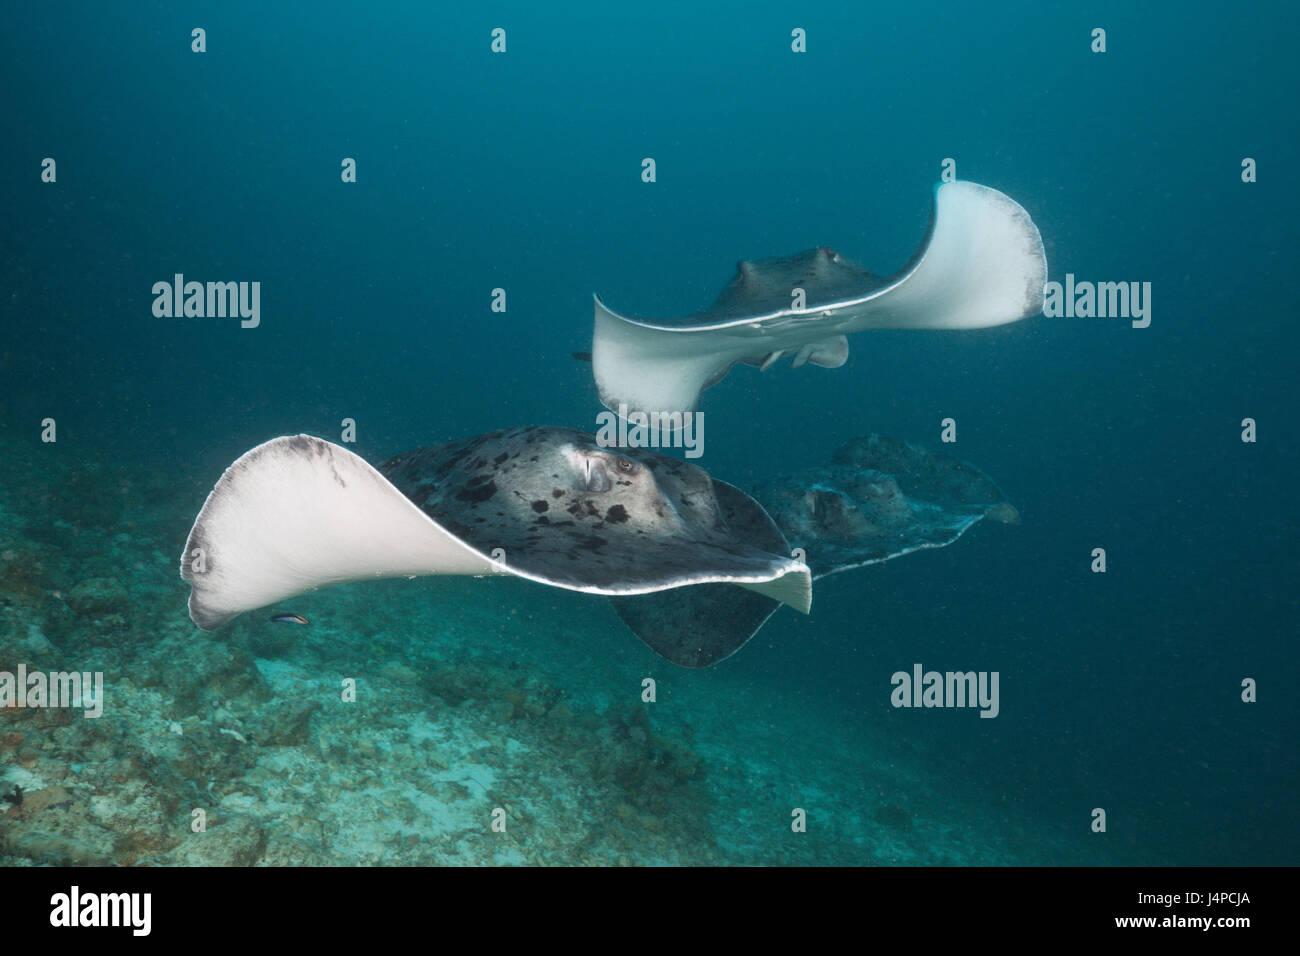 Group of black dot stingrays, Taeniura meyeni, the Maldives, Ellaidhoo house reef, the north Ari Atoll, - Stock Image